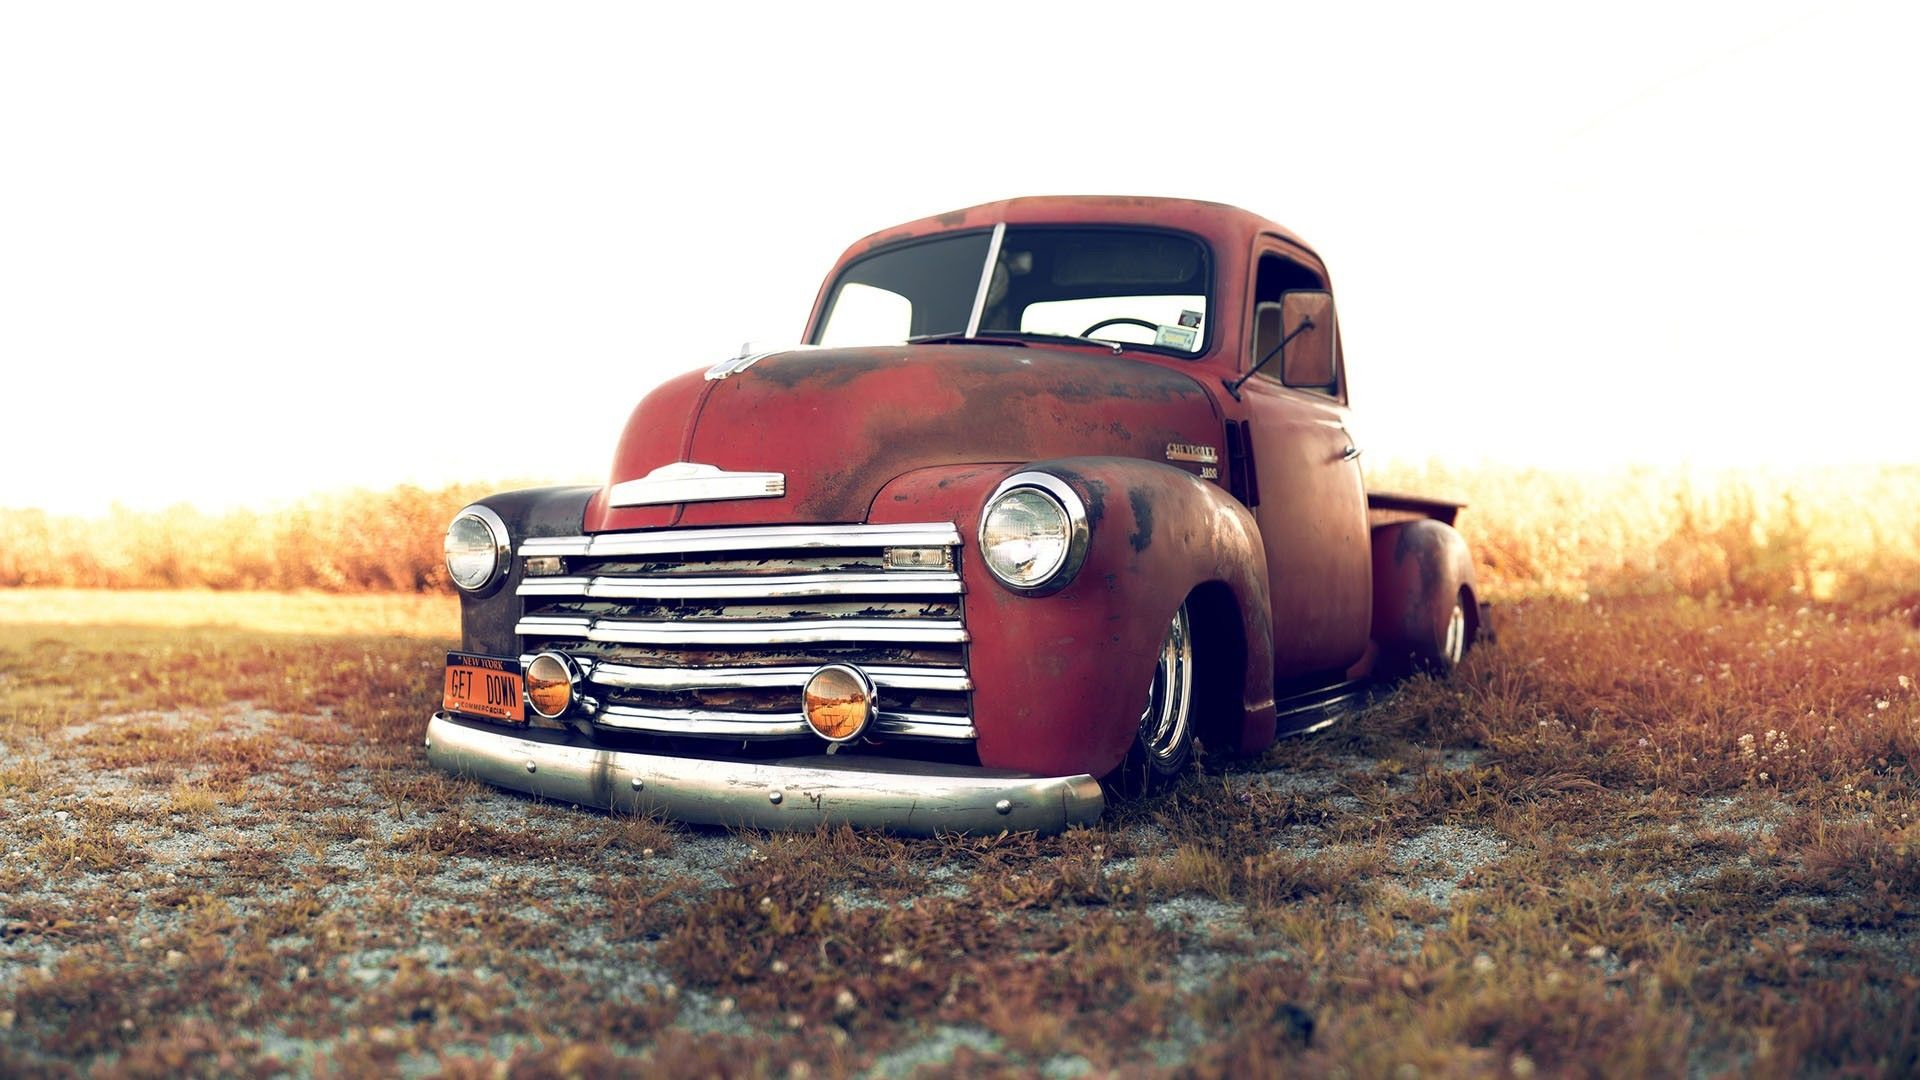 1920x1080 Chevy Truck Desktop Wallpaper Wallpapersafari Chevy Trucks Chevrolet Trucks Chevy Pickups